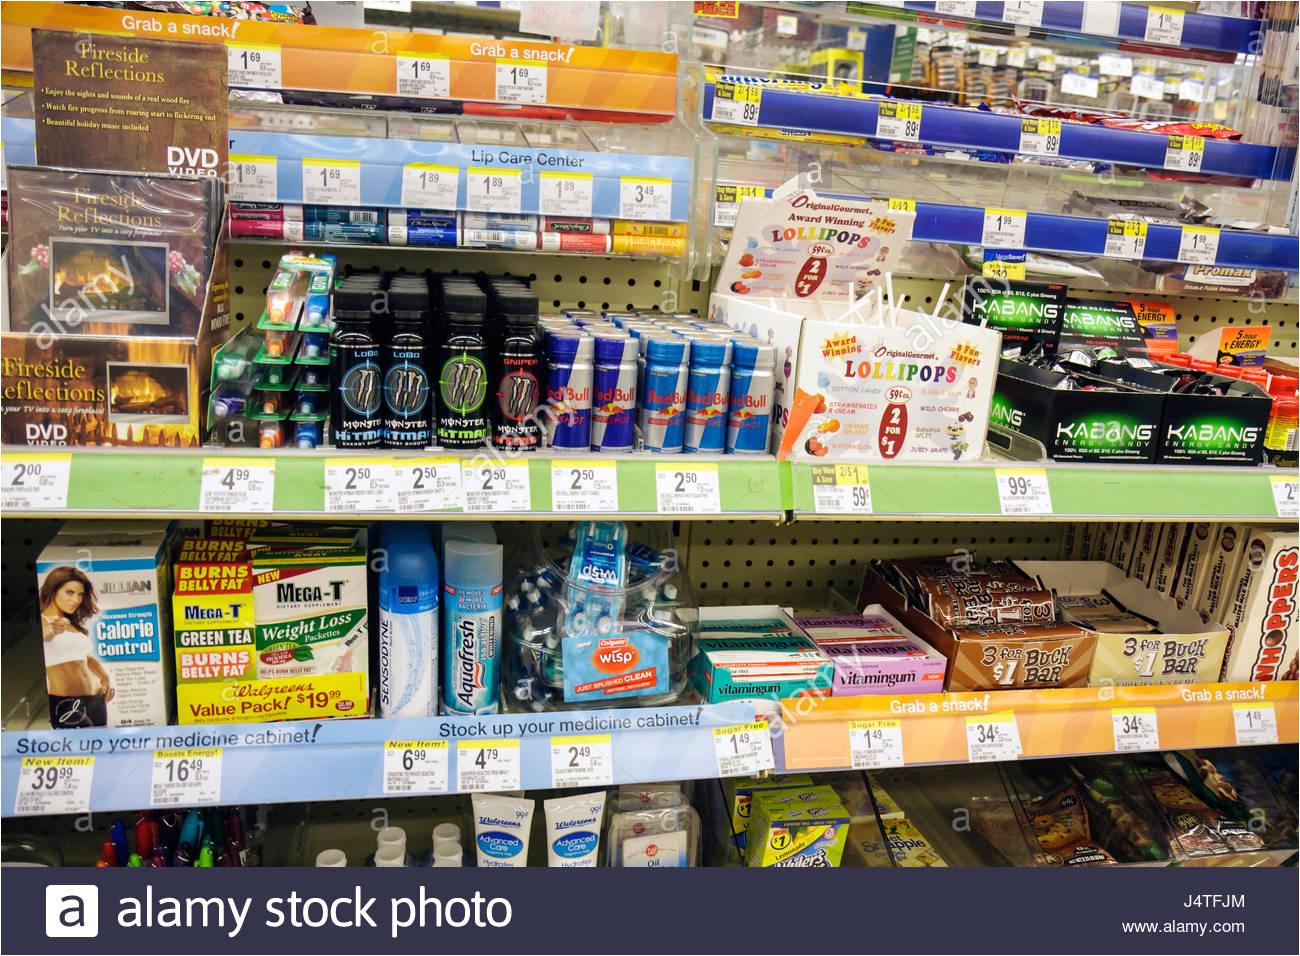 winter park florida walgreens walgreens drug store apothekenkette business produkt anzeigen kasse gang marke wettbewerb stockbild